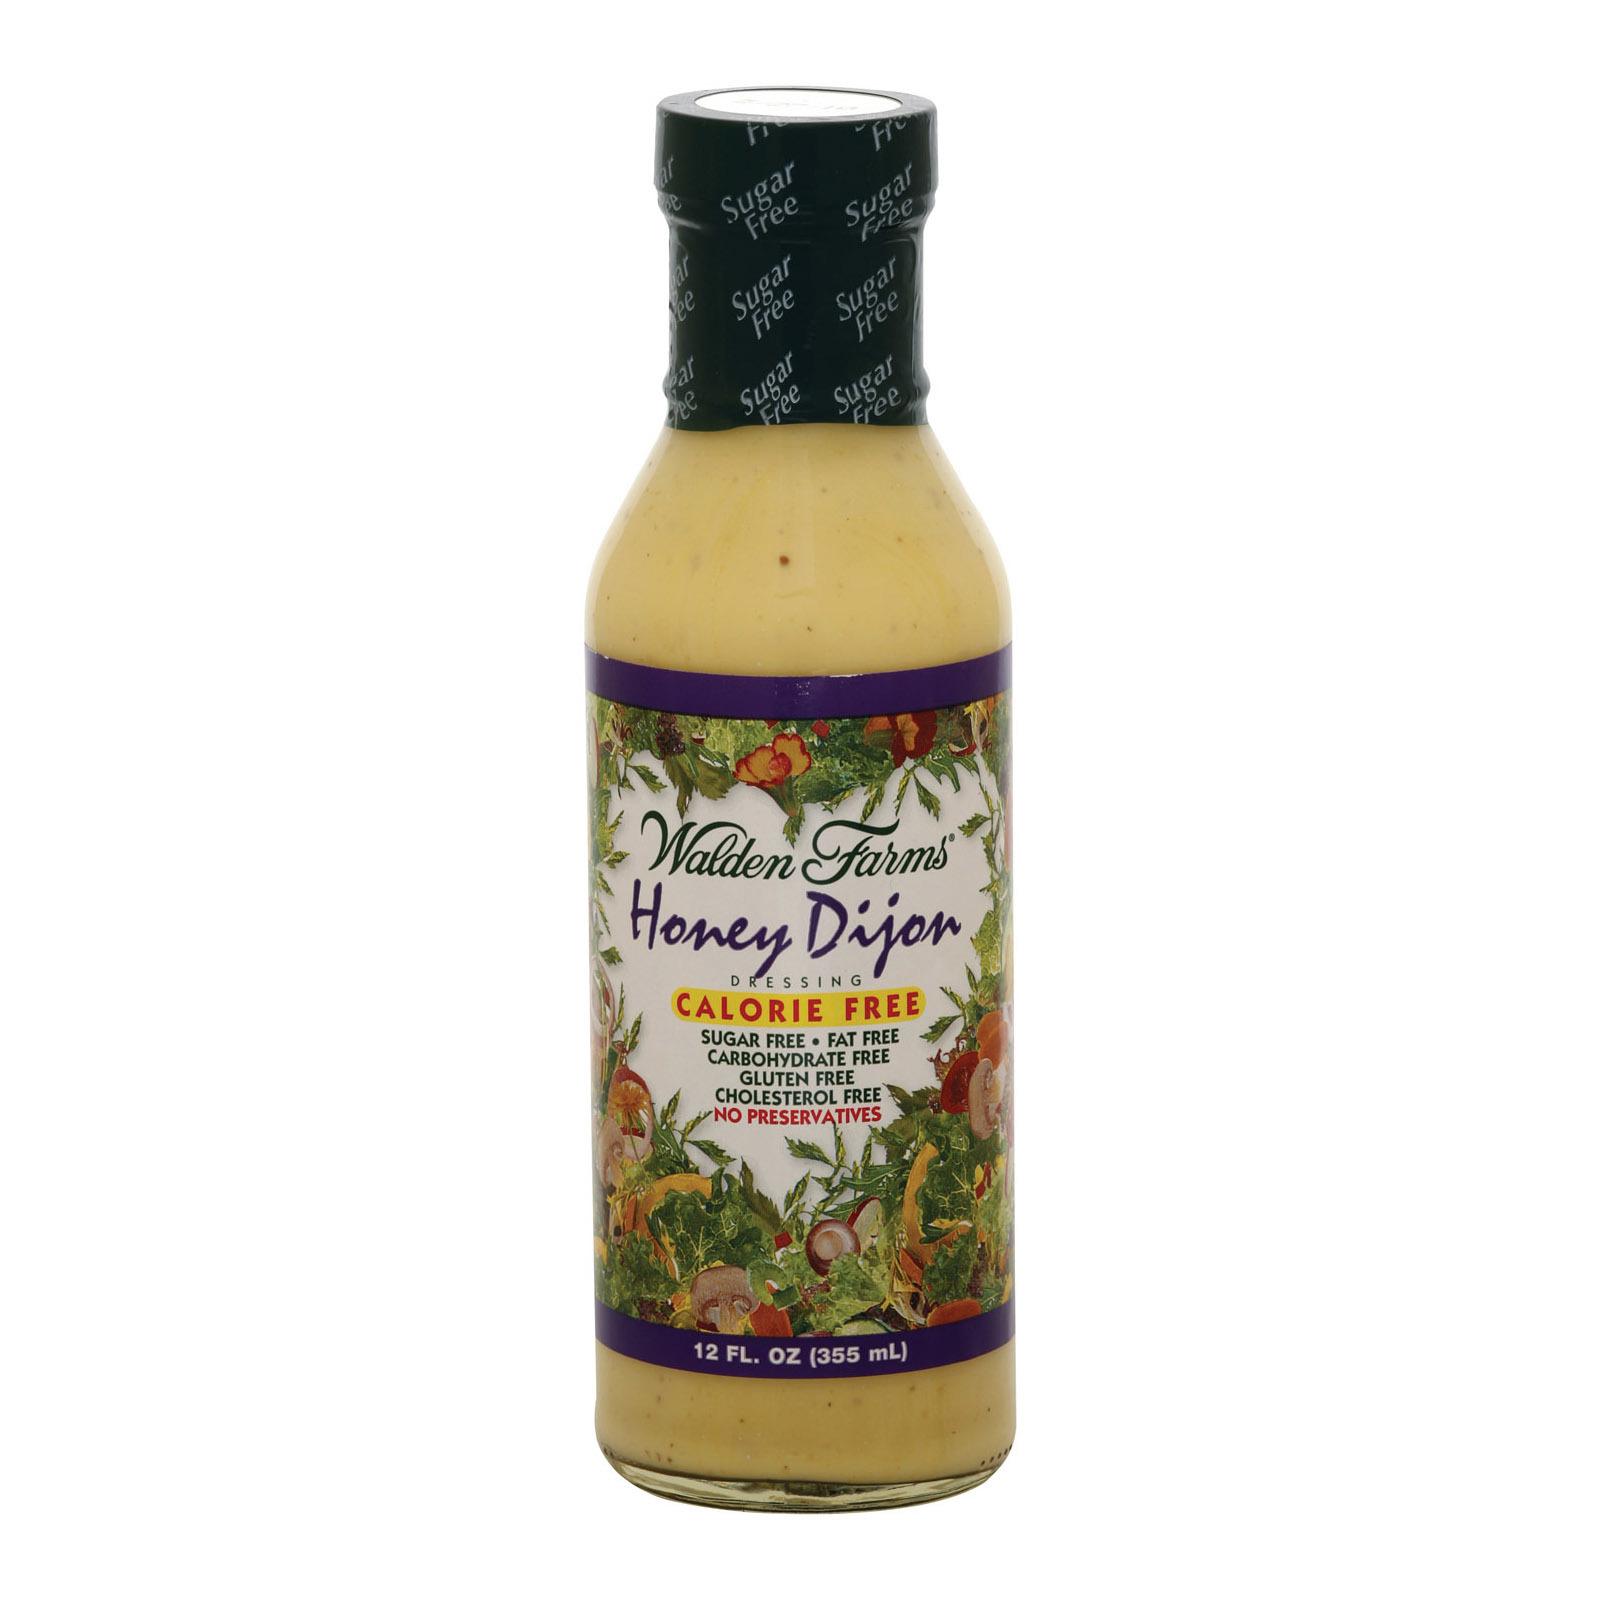 Walden Farms Dressing - Honey Dijon - Case of 6 - 12 fl oz